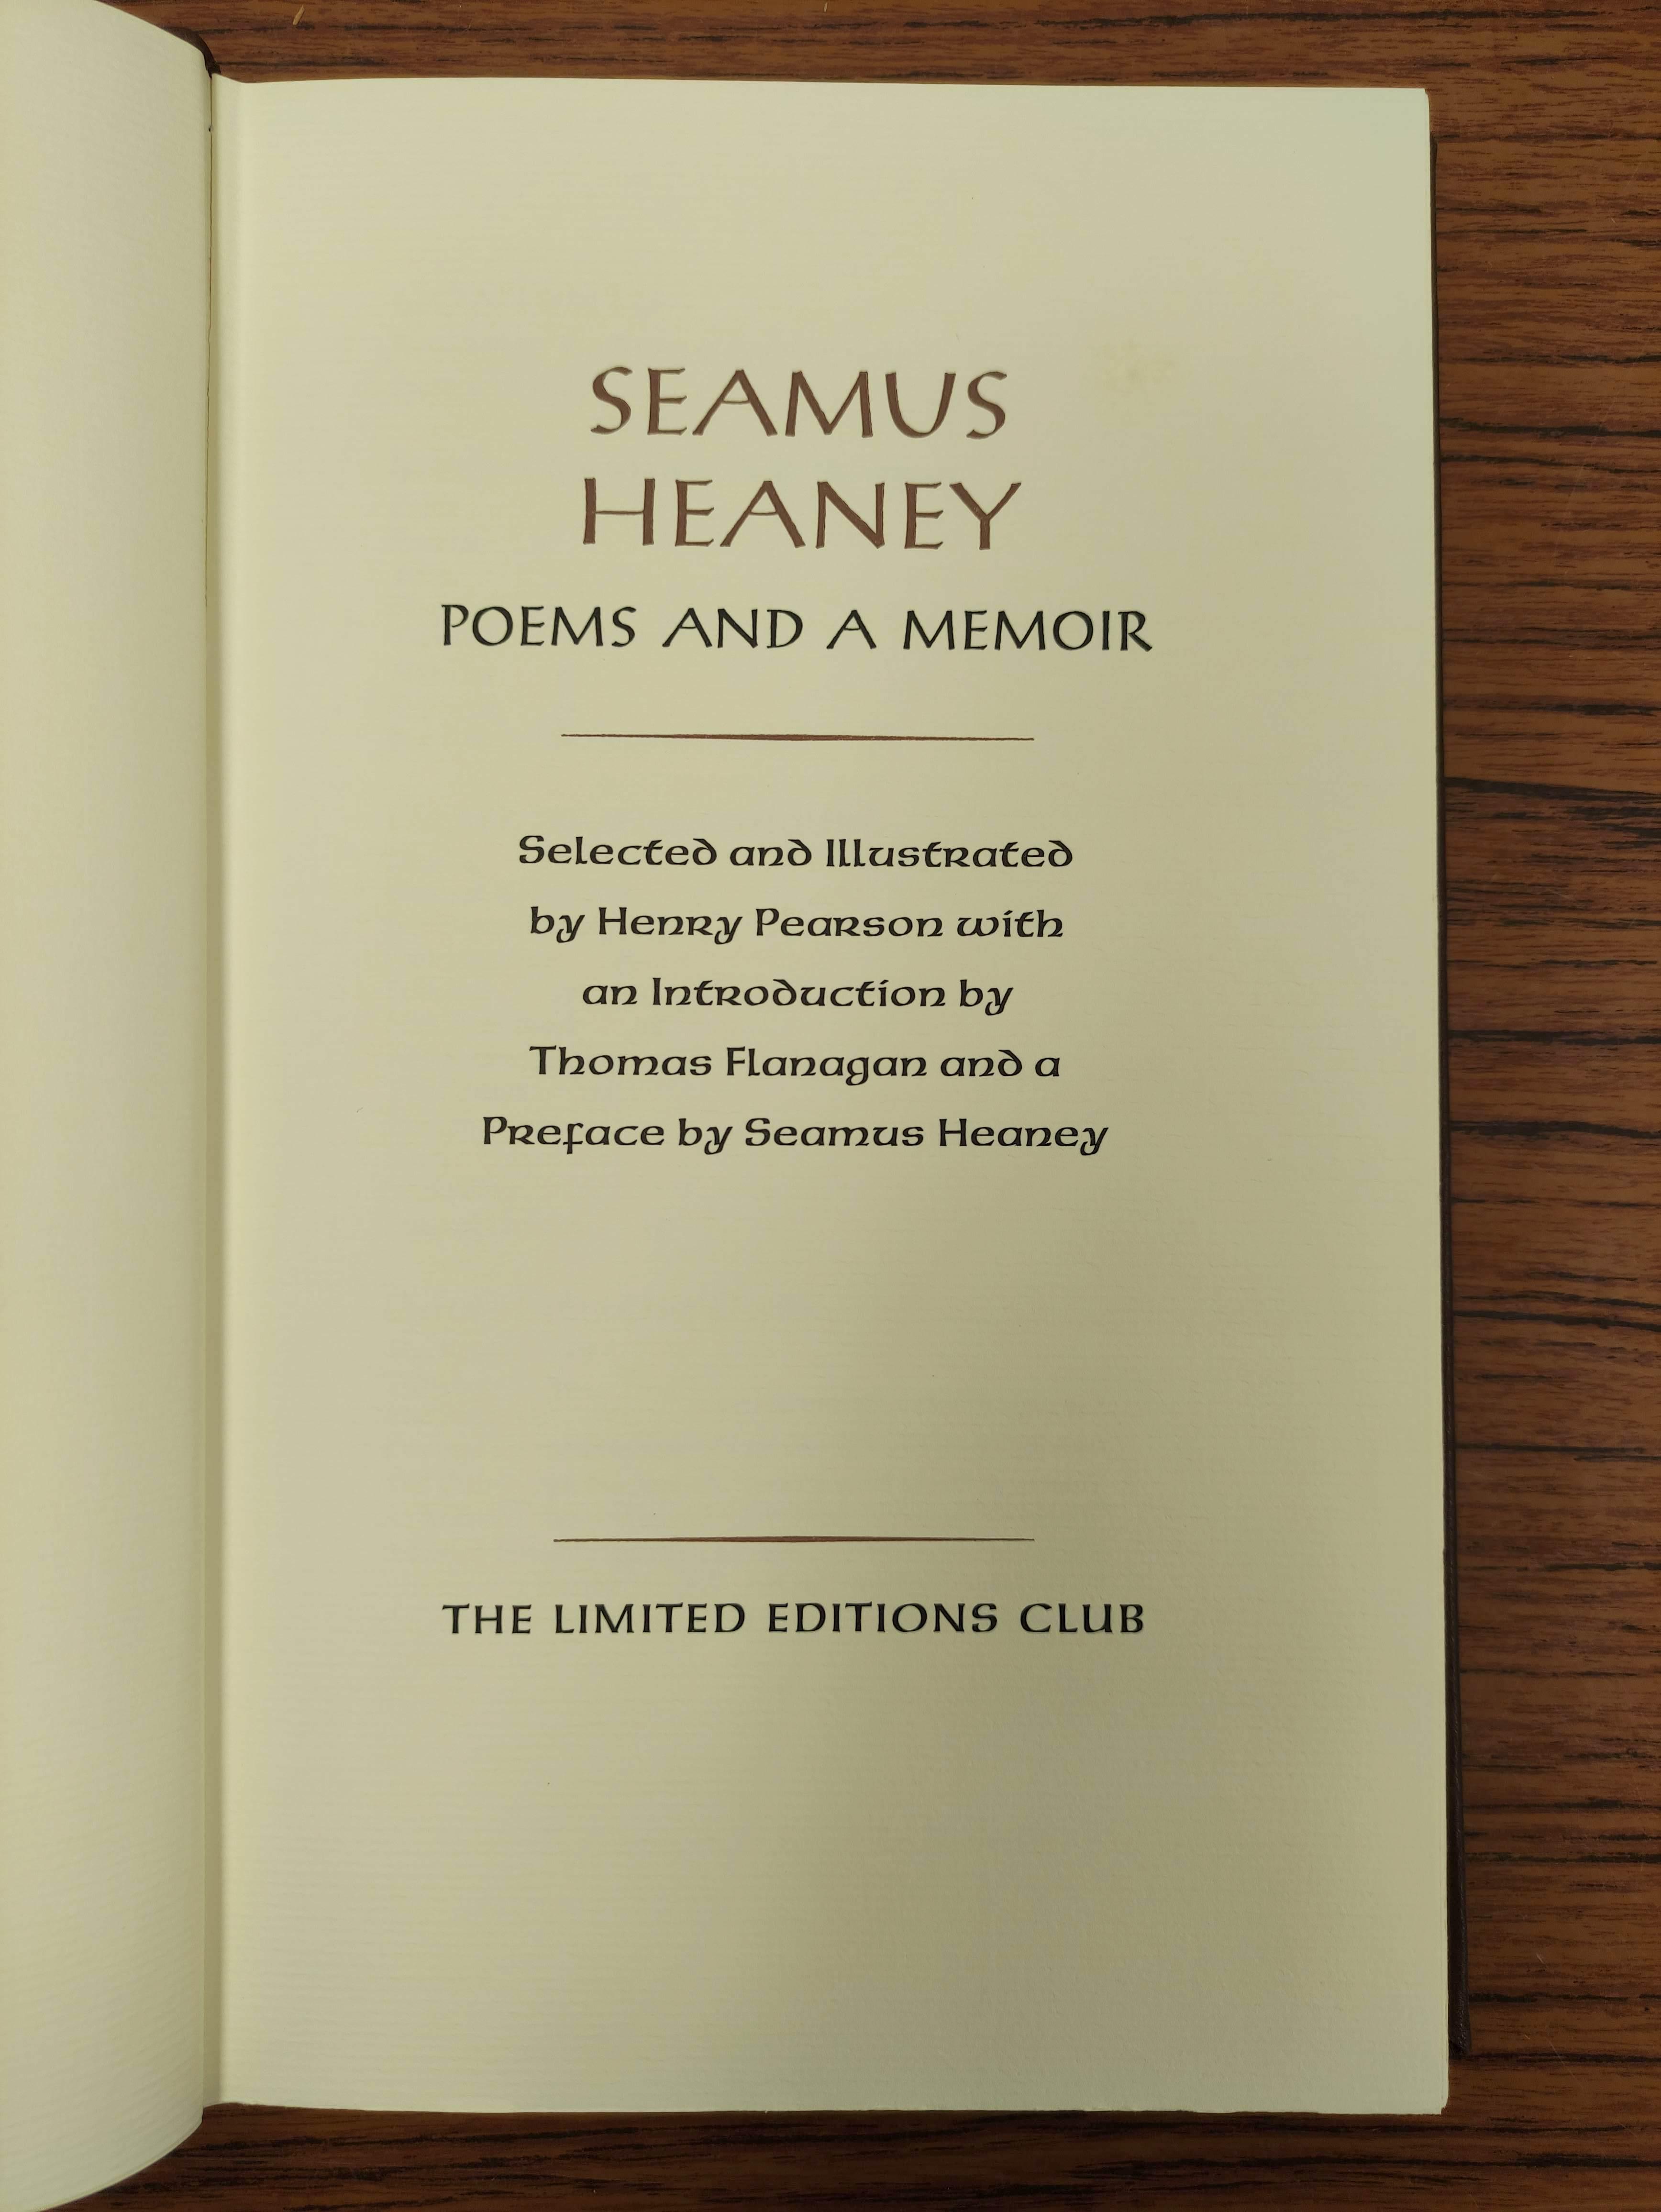 HEANEY SEAMUS.Poems & Memoir. Signed ltd. ed. 1197/2000. Plates. Folio. Calf in slip case. Limited - Image 4 of 8